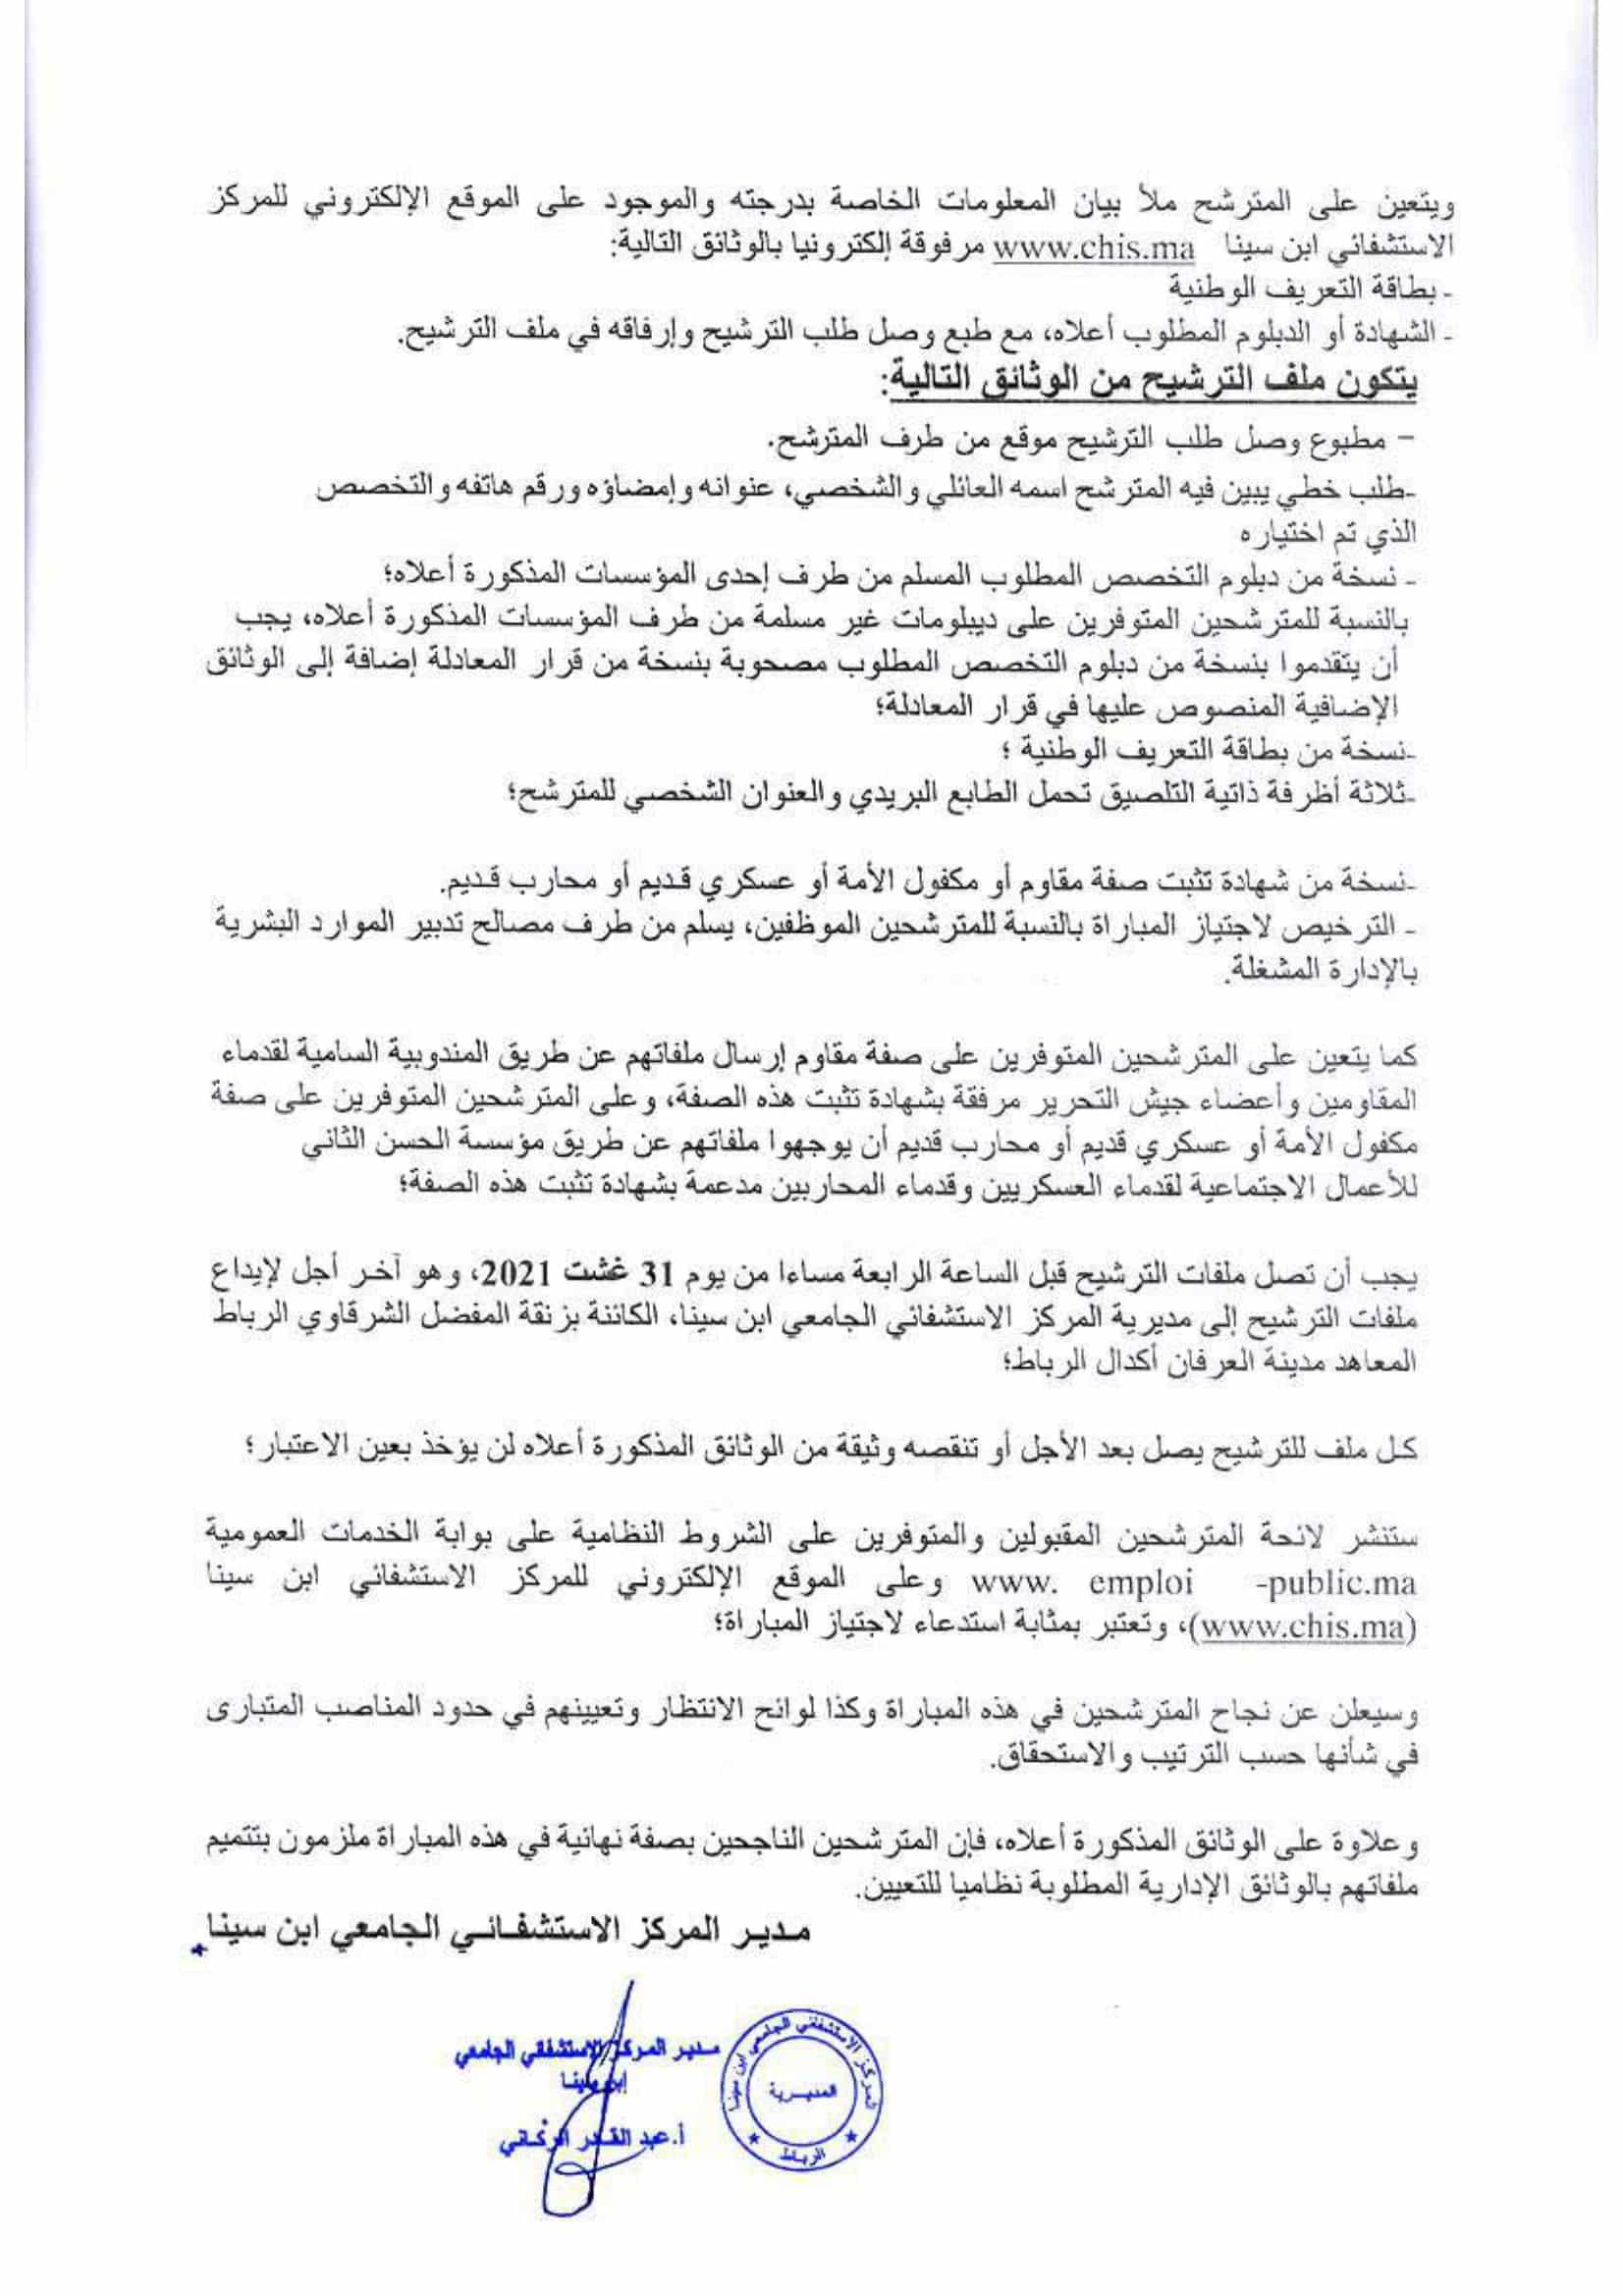 decisionavisrecrutementinfiettechsante 5 Concours CHU Ibn Sina 2021 (298 Postes)